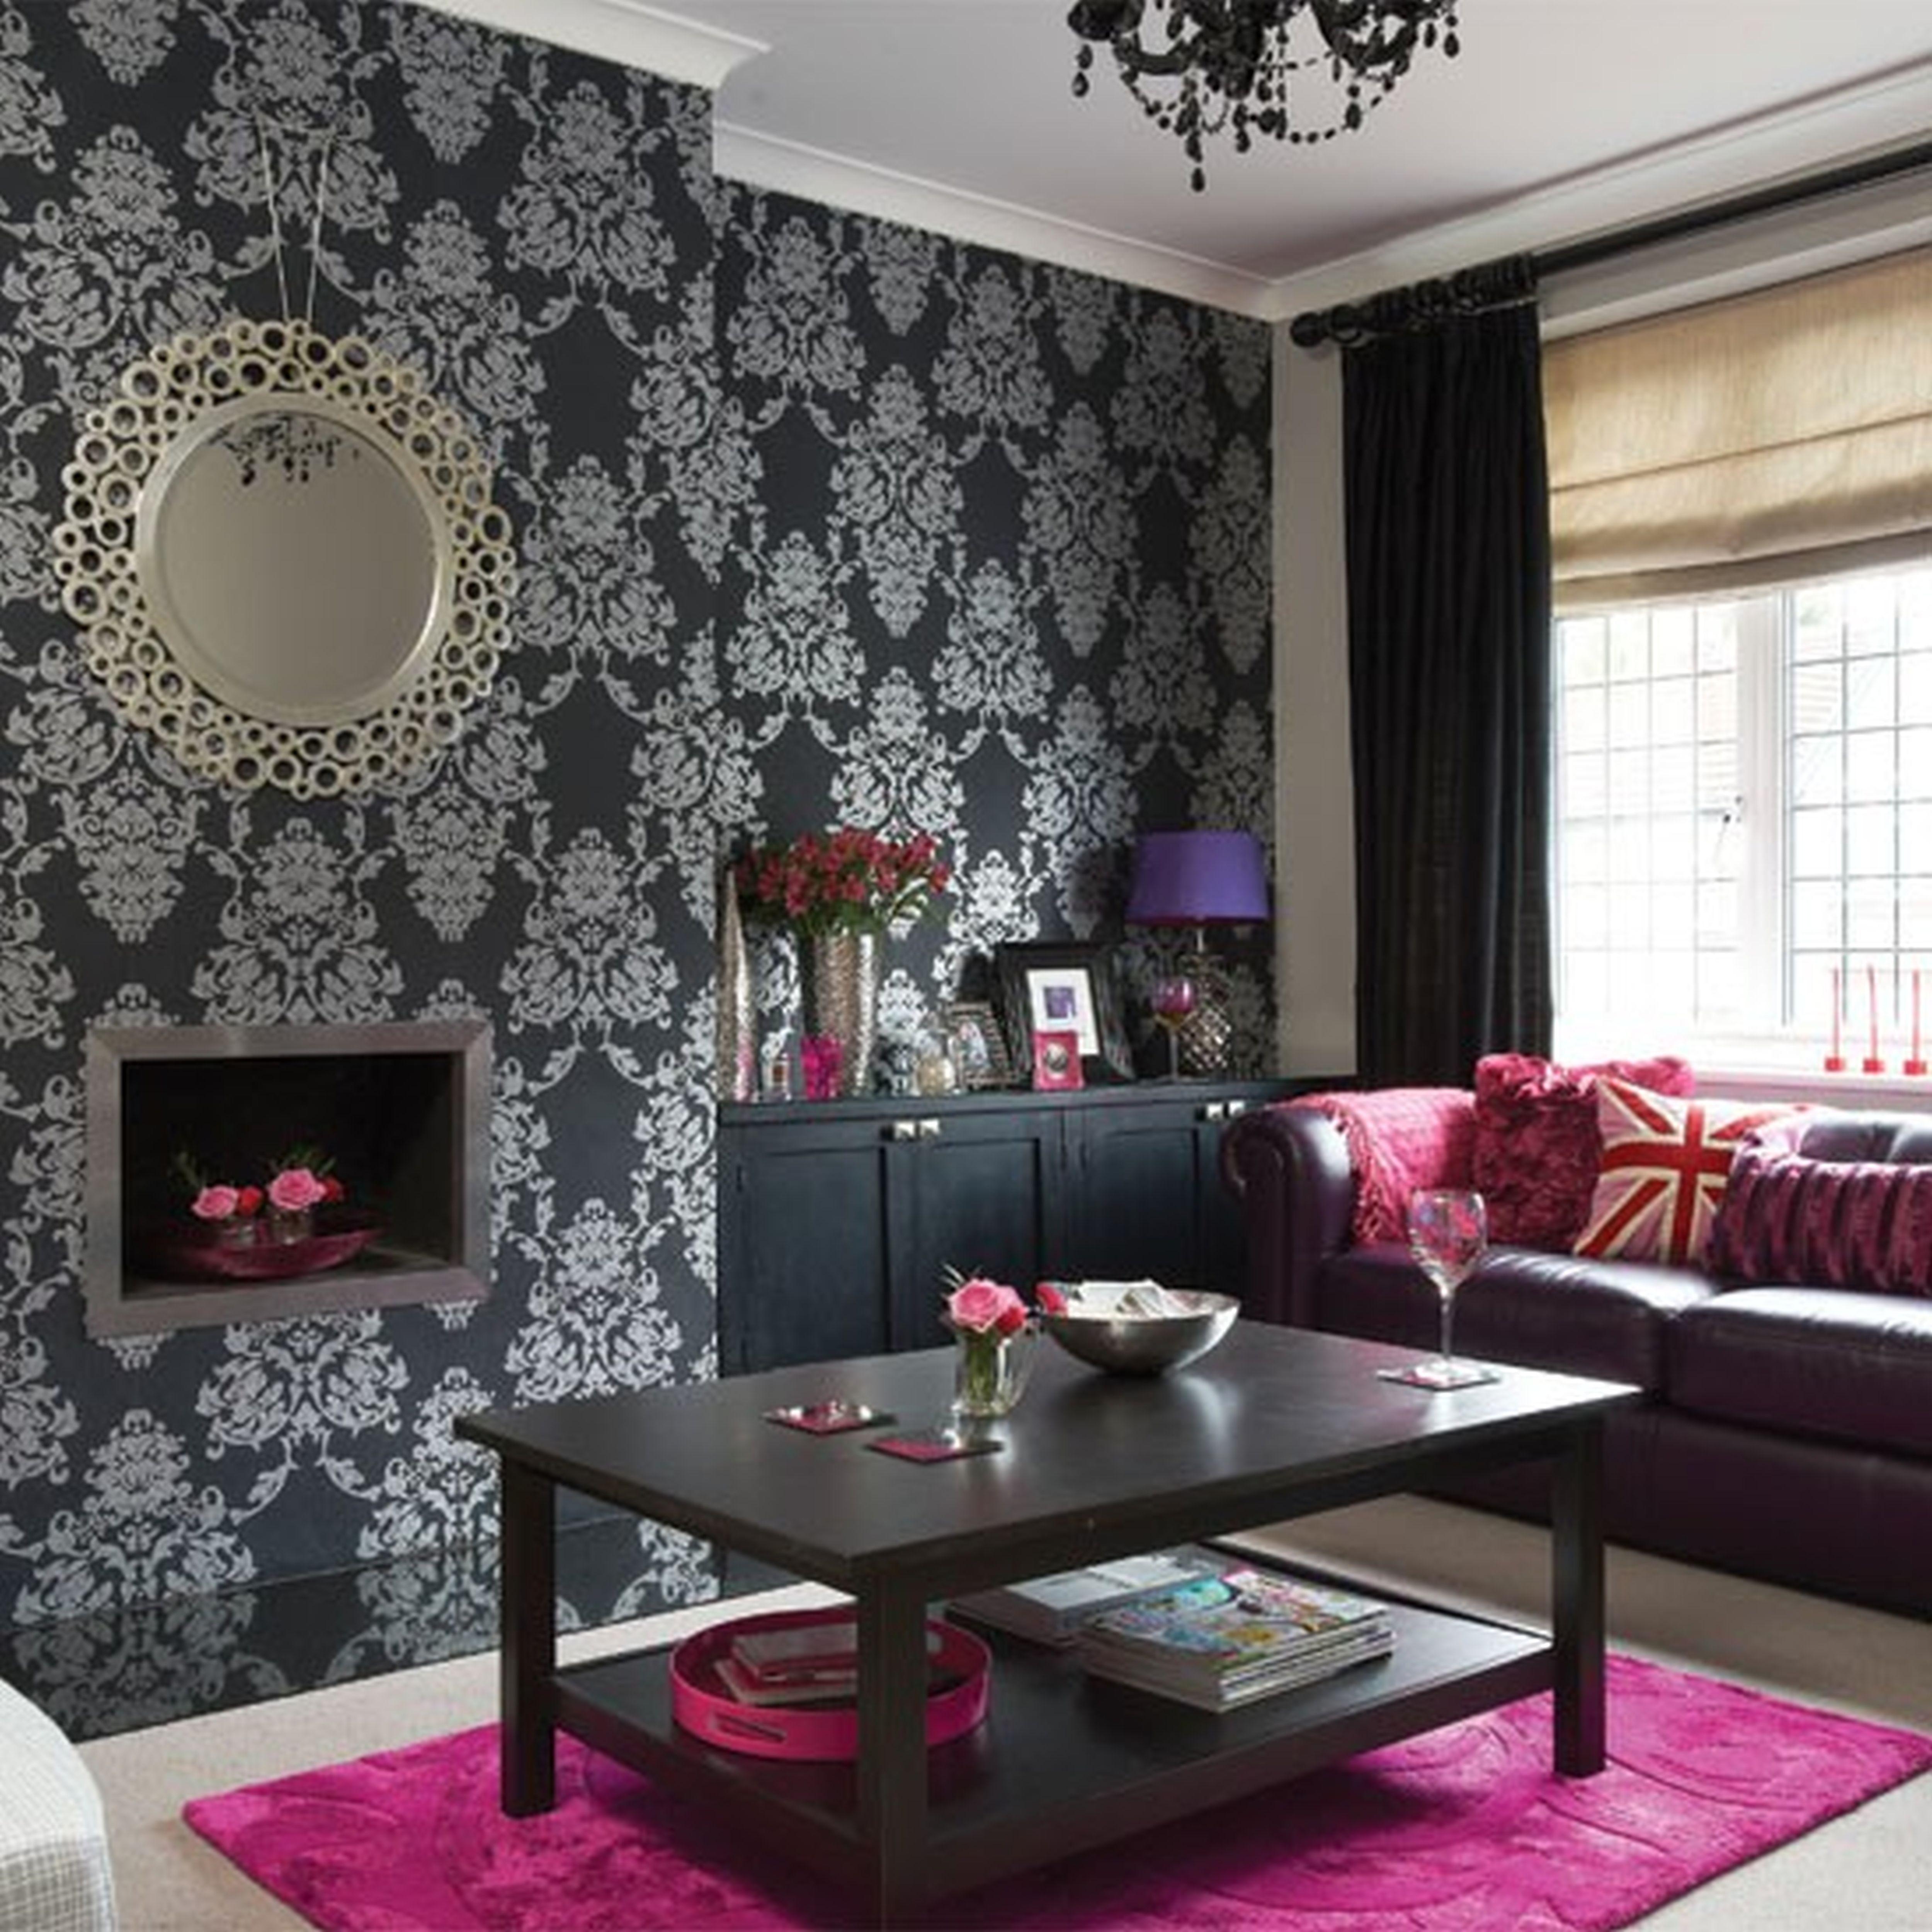 Pin On Renovation #purple #and #black #living #room #ideas